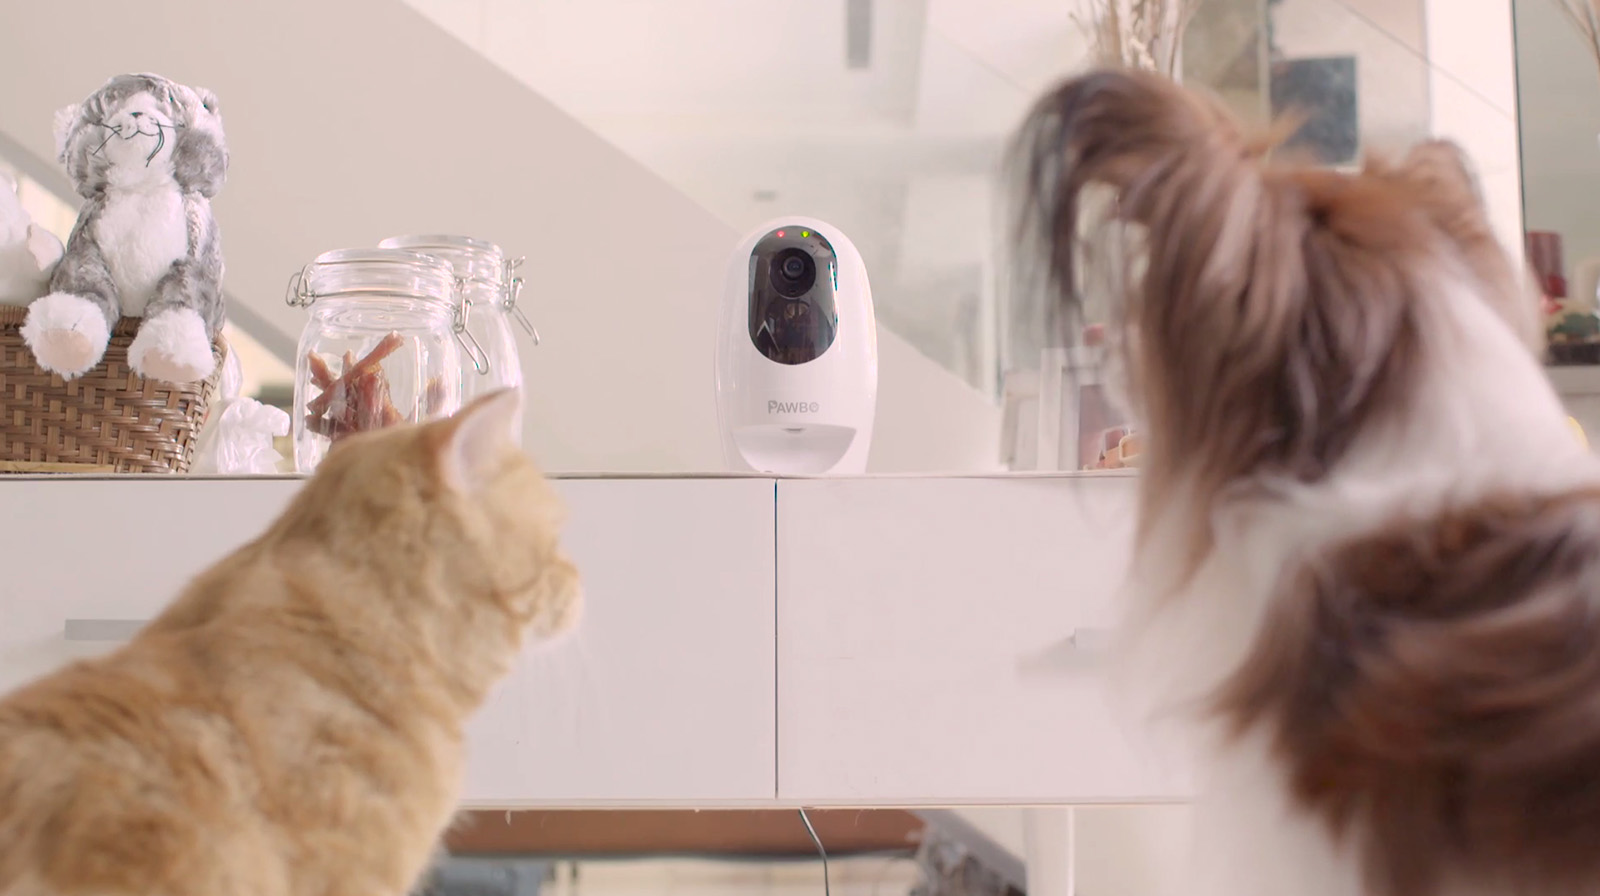 Acer presenta Pawbo+, la cámara interactiva para mascotas